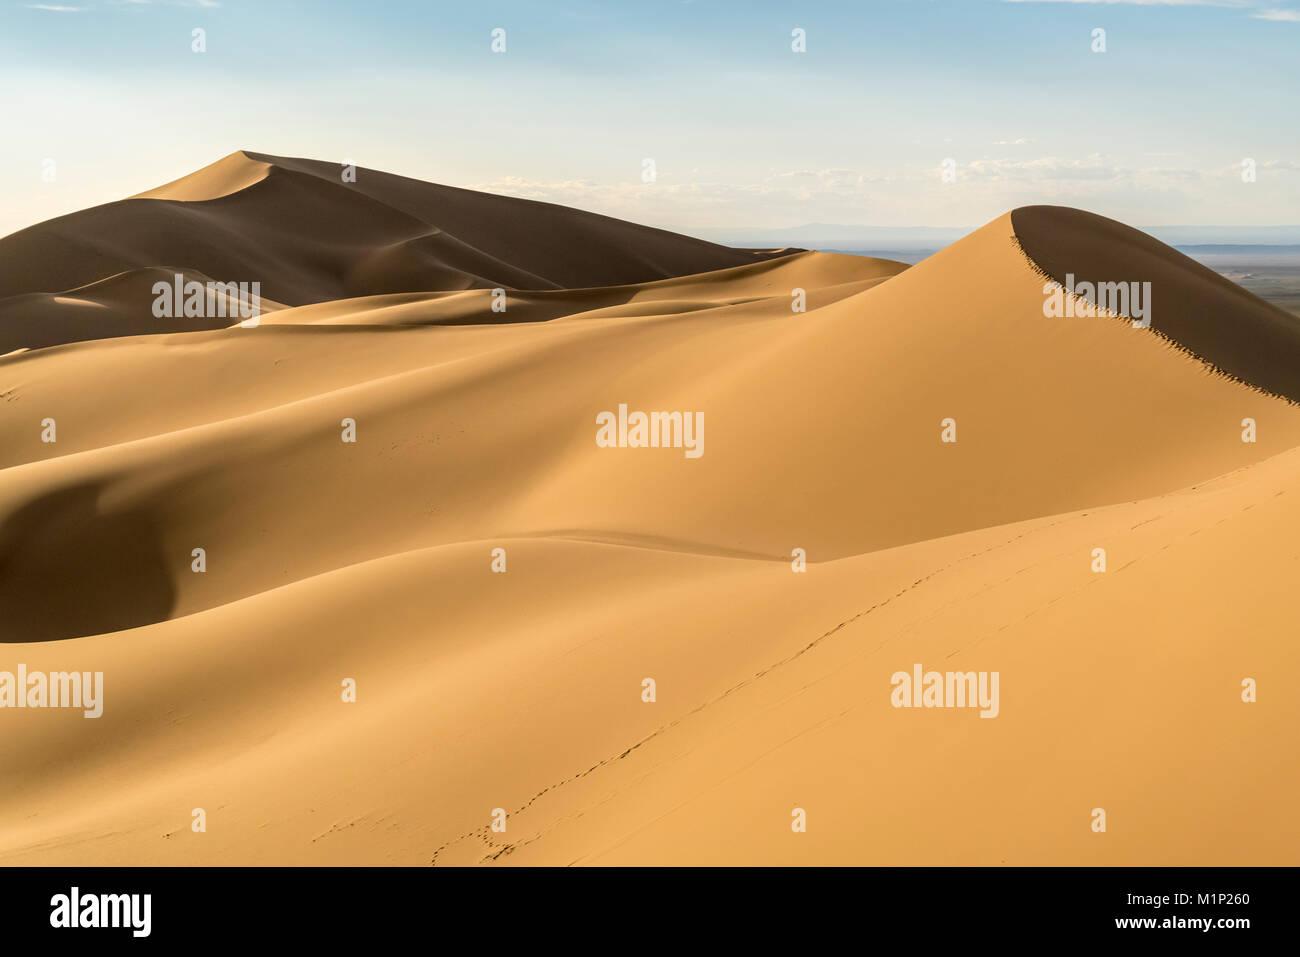 Khongor dune di sabbia in Gobi Gurvan Saikhan National Park, Sevrei distretto, a sud della provincia di Gobi, Mongolia, Asia Centrale, Asia Foto Stock